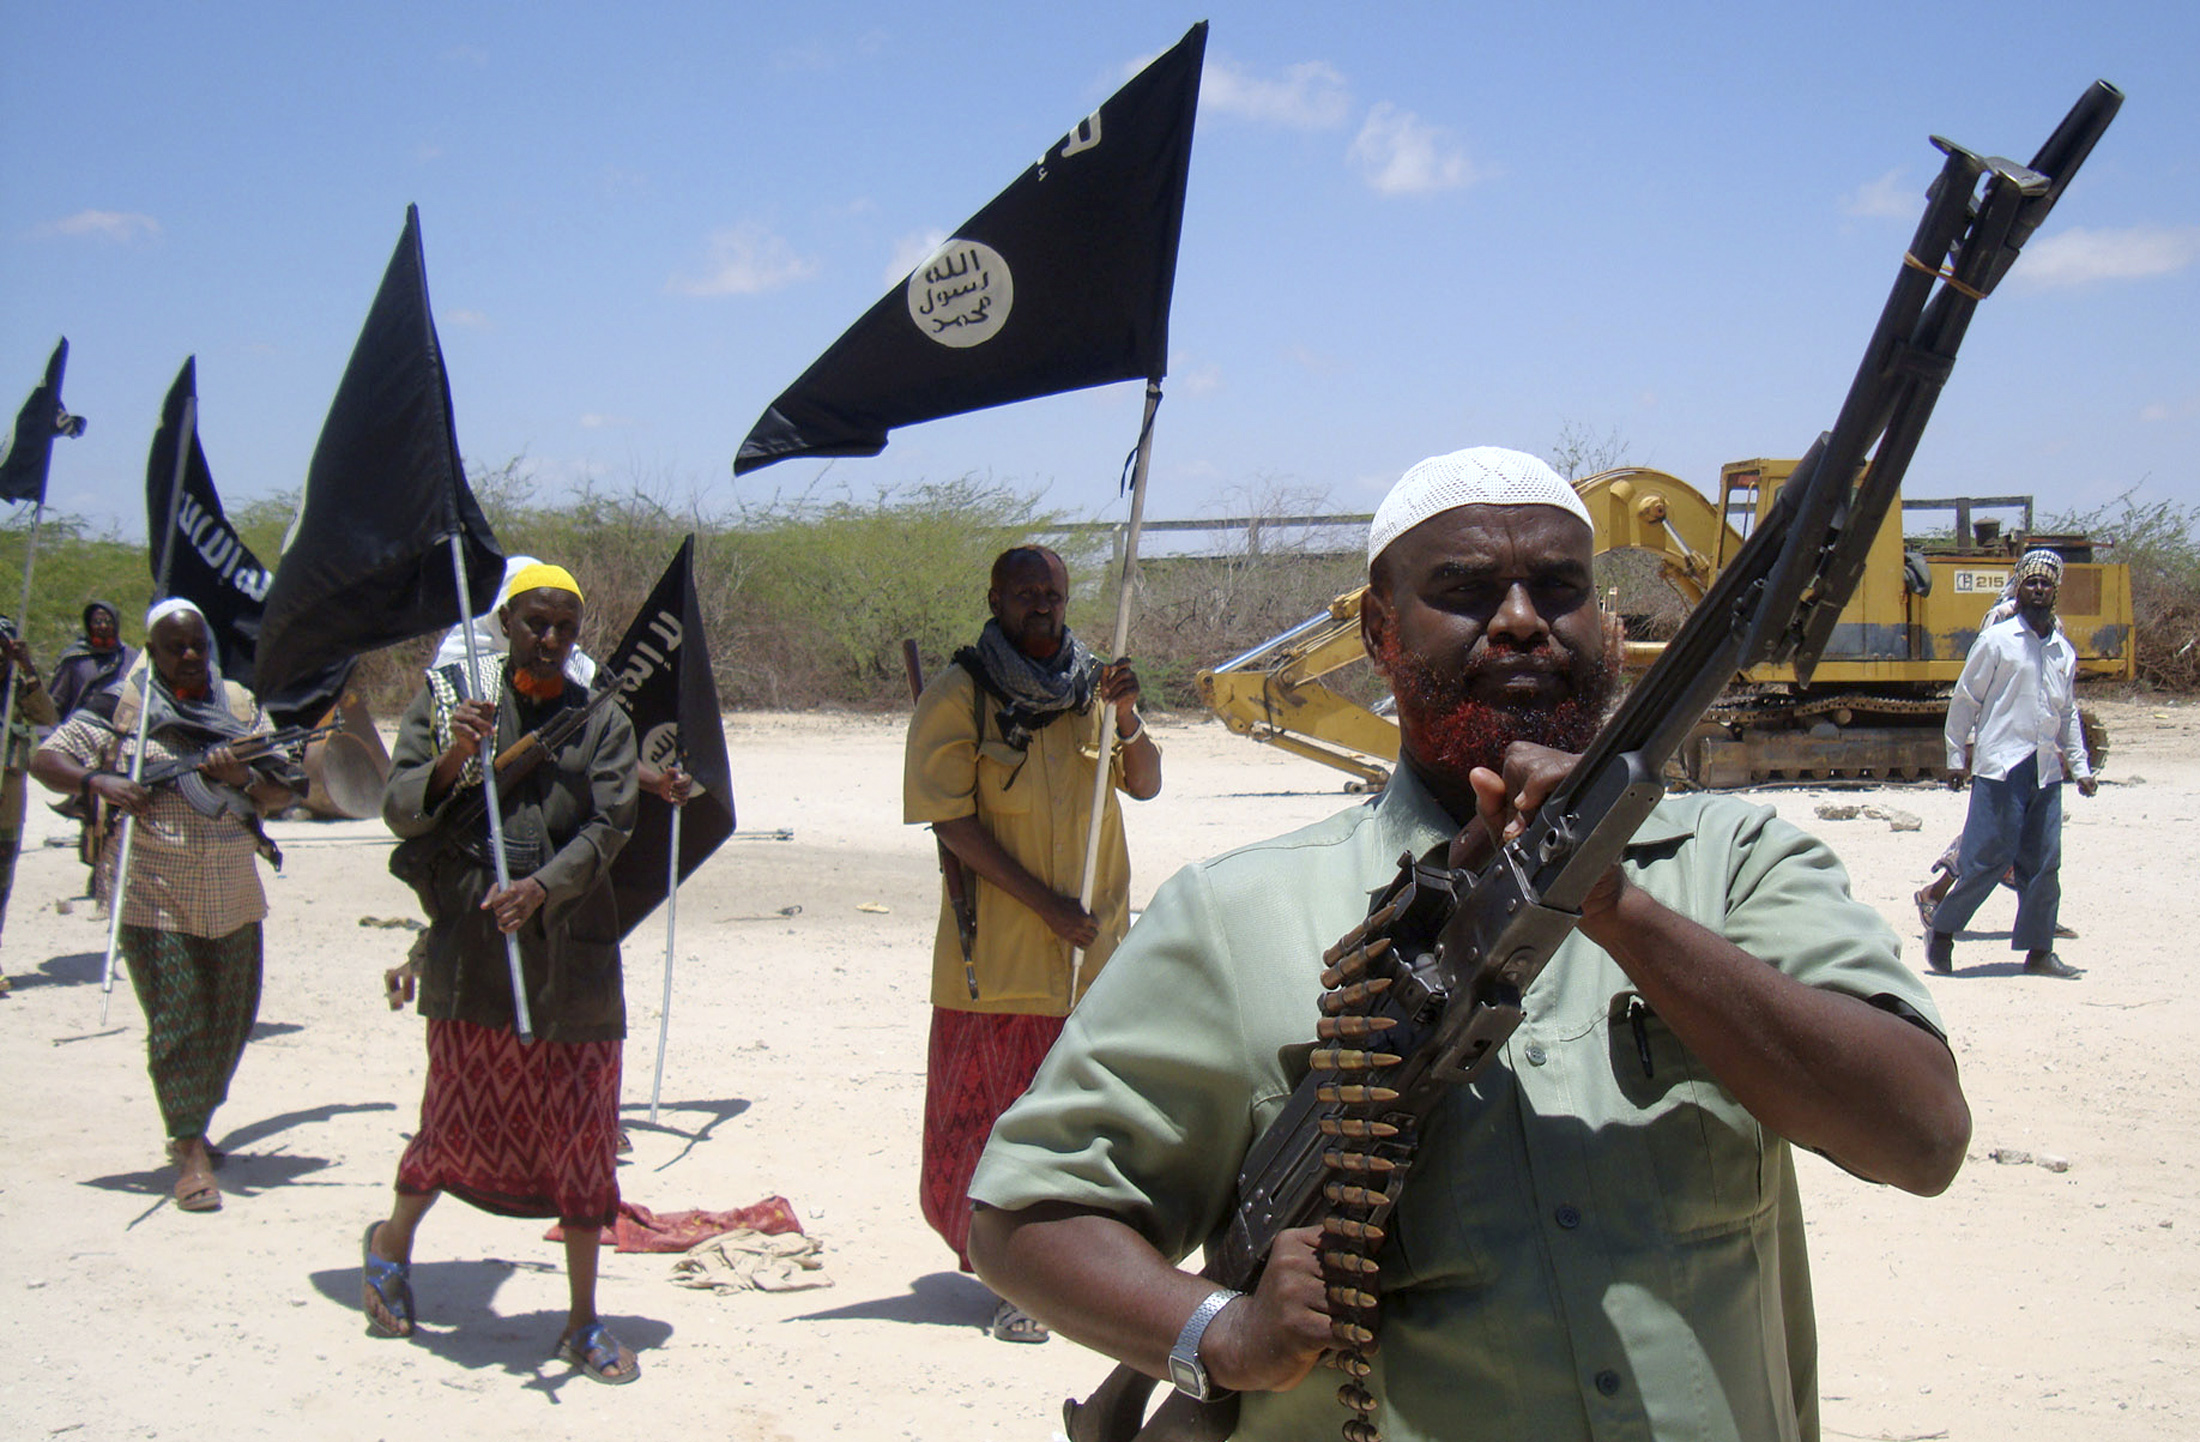 Na de aanslag van Al-Shabaab in Kenia. Afrikaanse socialist over strijd tegen terreur en imperialisme